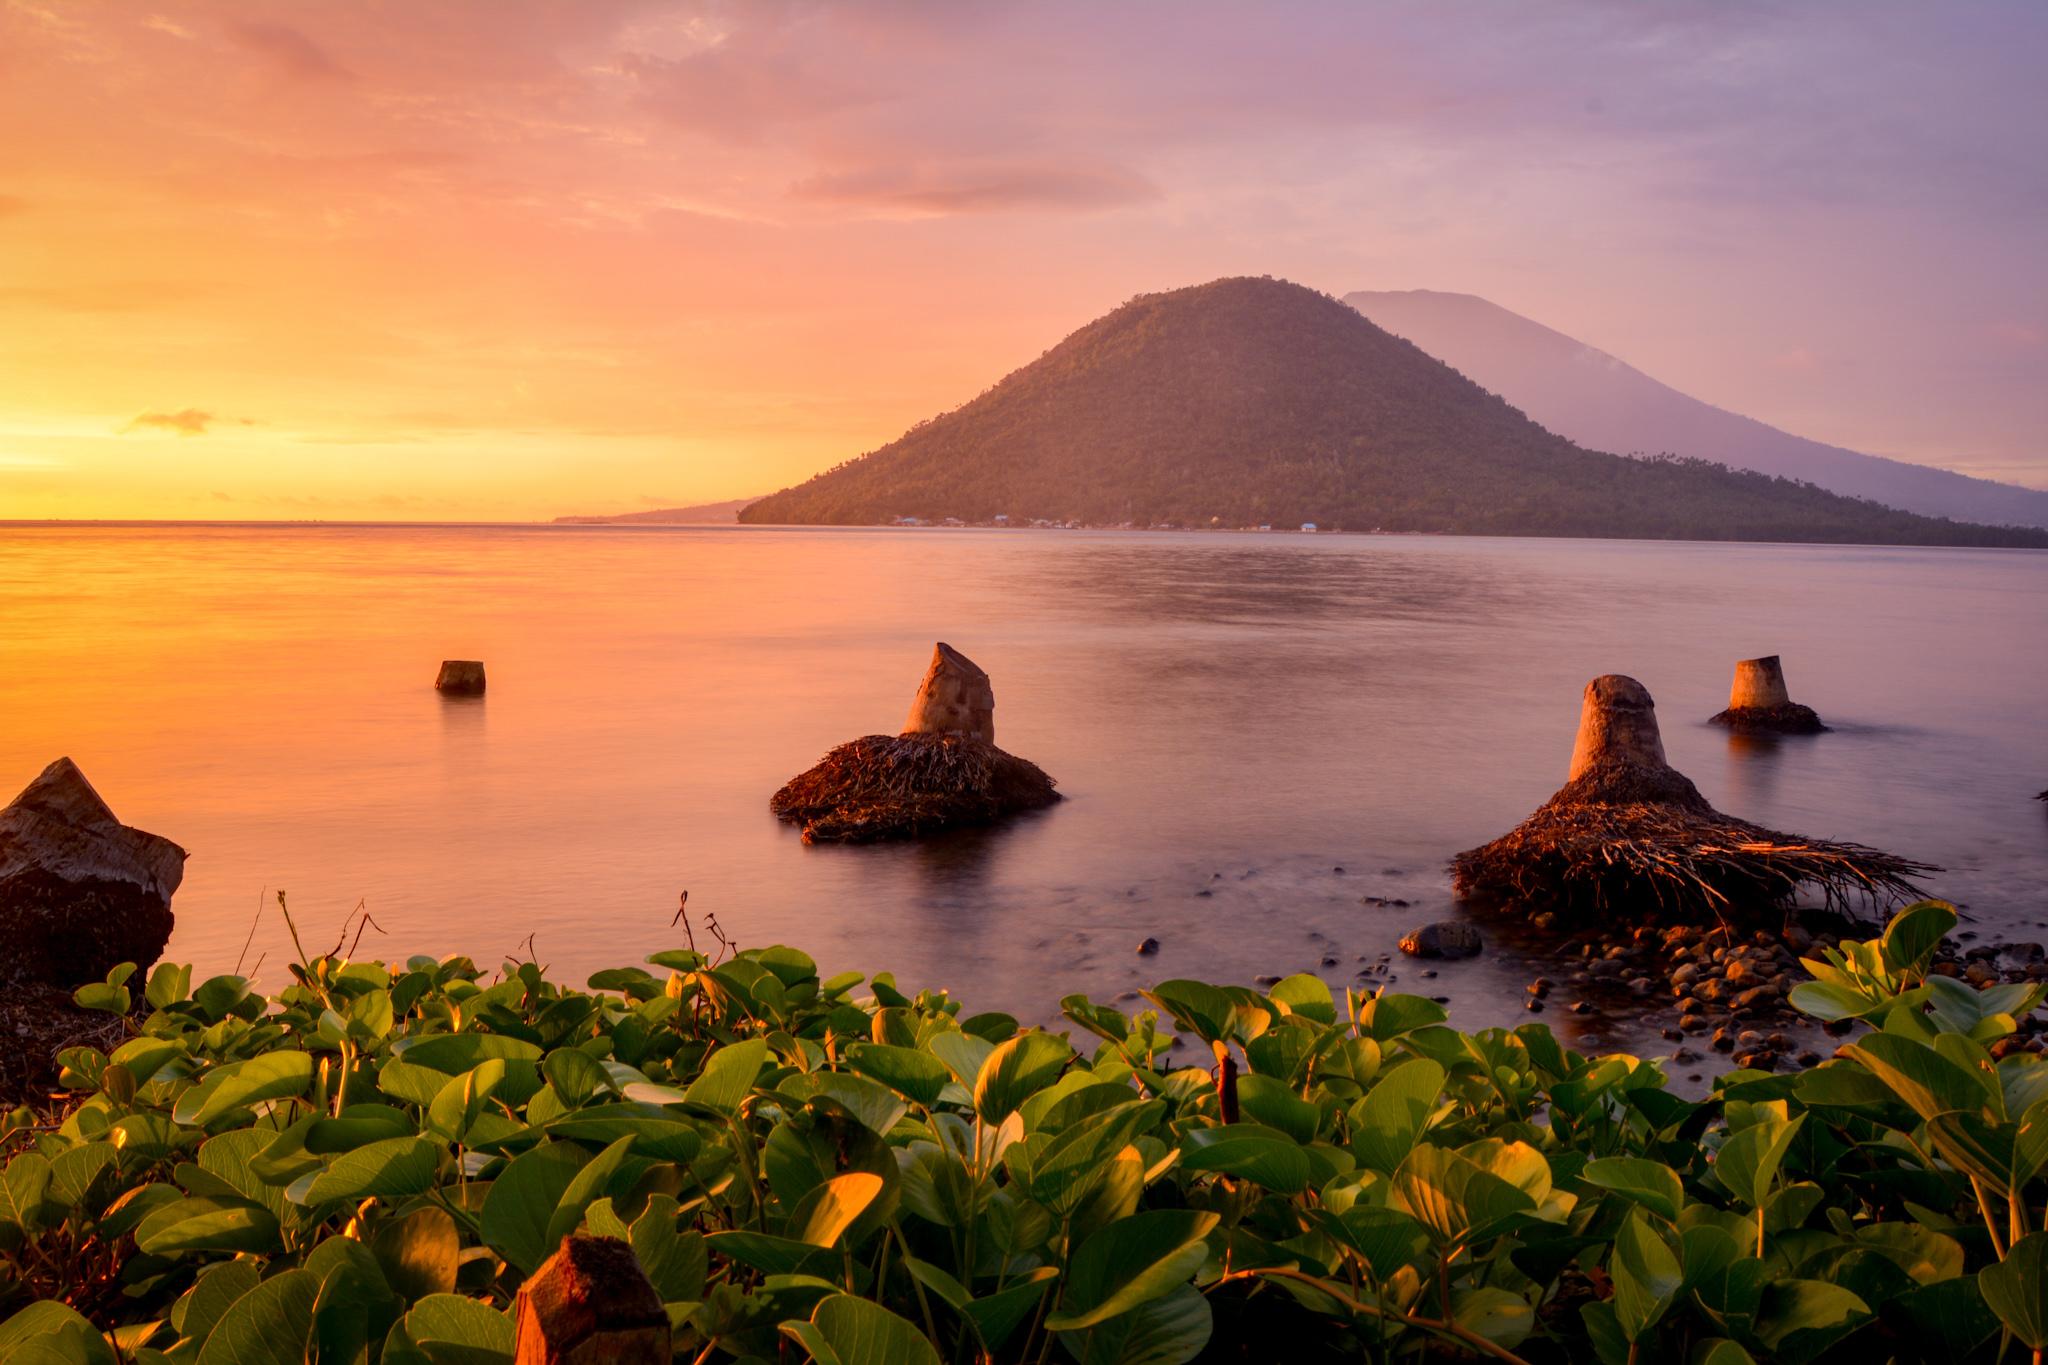 Ternate sunset mountain and water